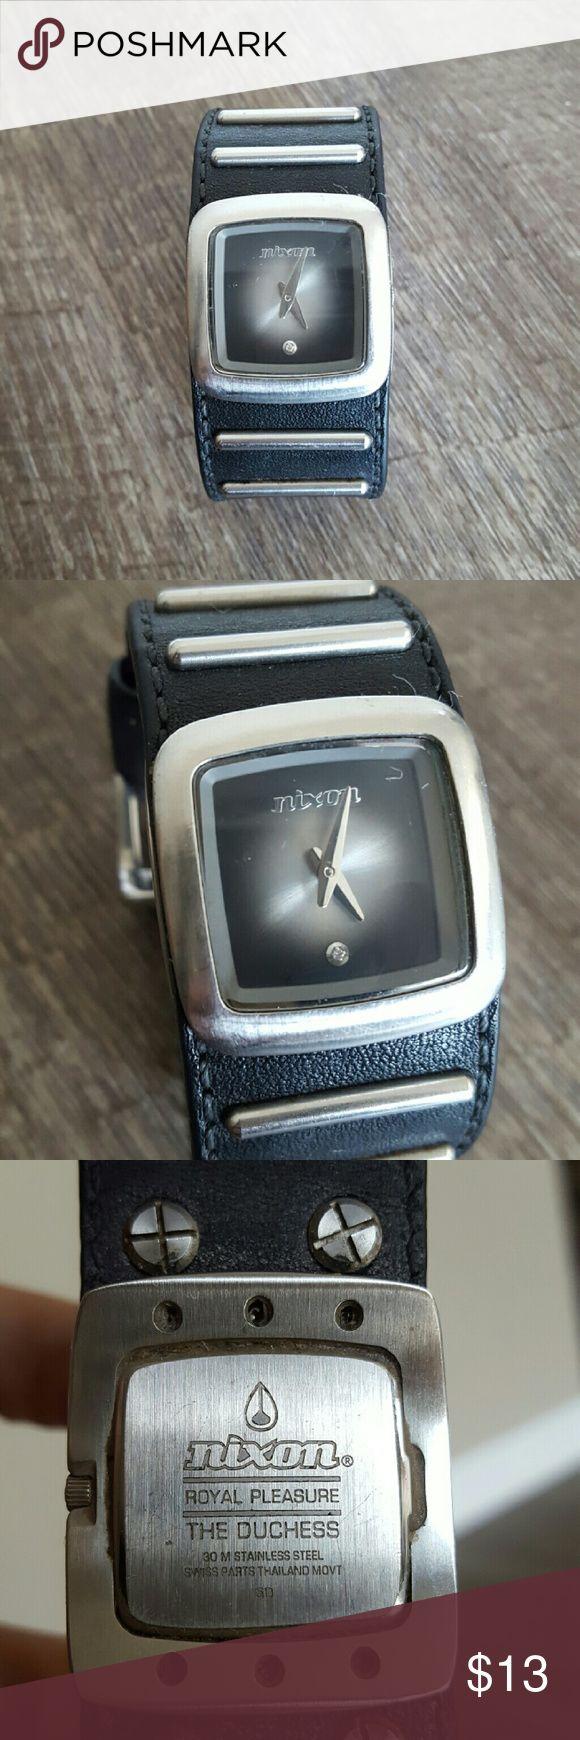 Nixon Wrist Watch - The Duchess Nixon Women's Wrist Watch.  Style: The Duchess.  Battery just needs to be replaced. Nixon Accessories Watches